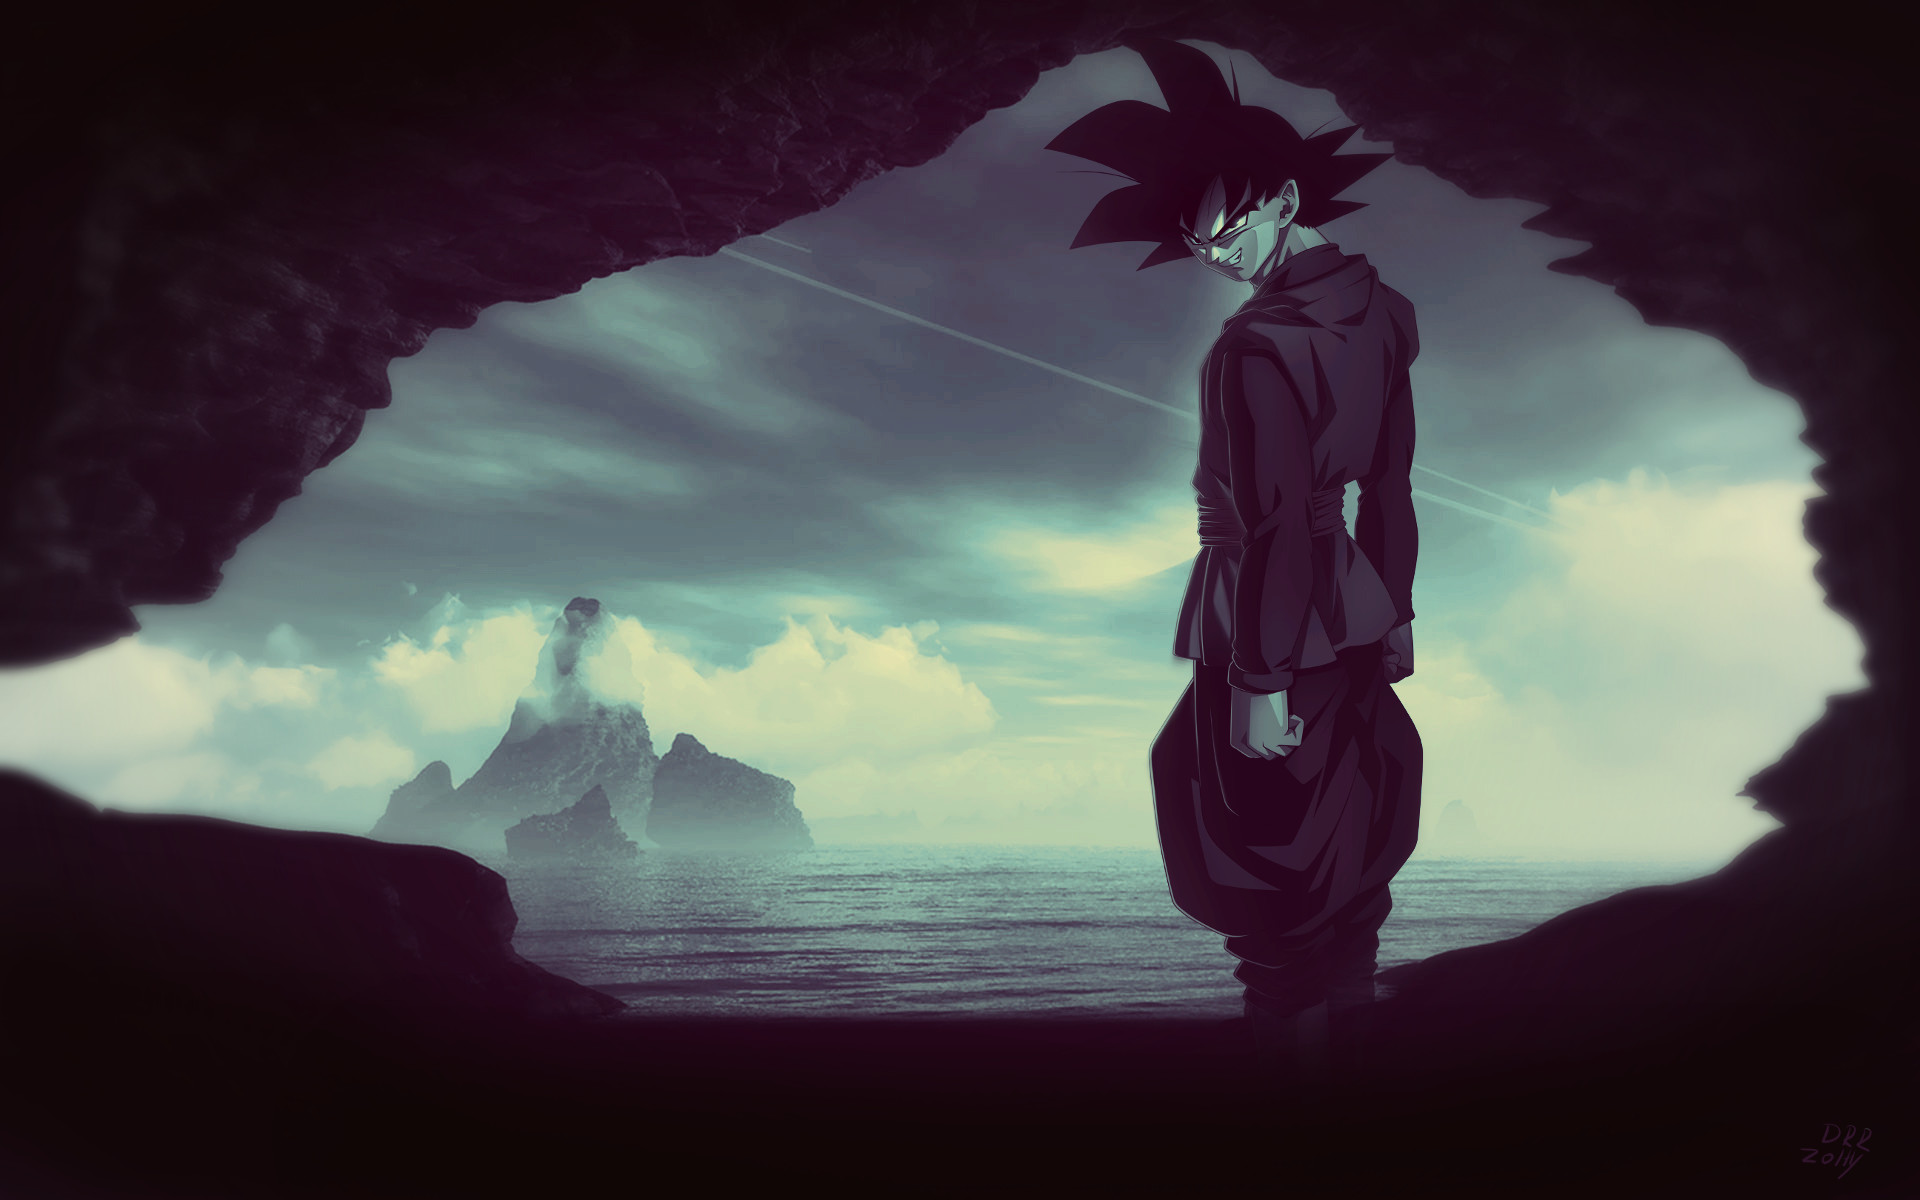 Goku Backgrounds 65 Images